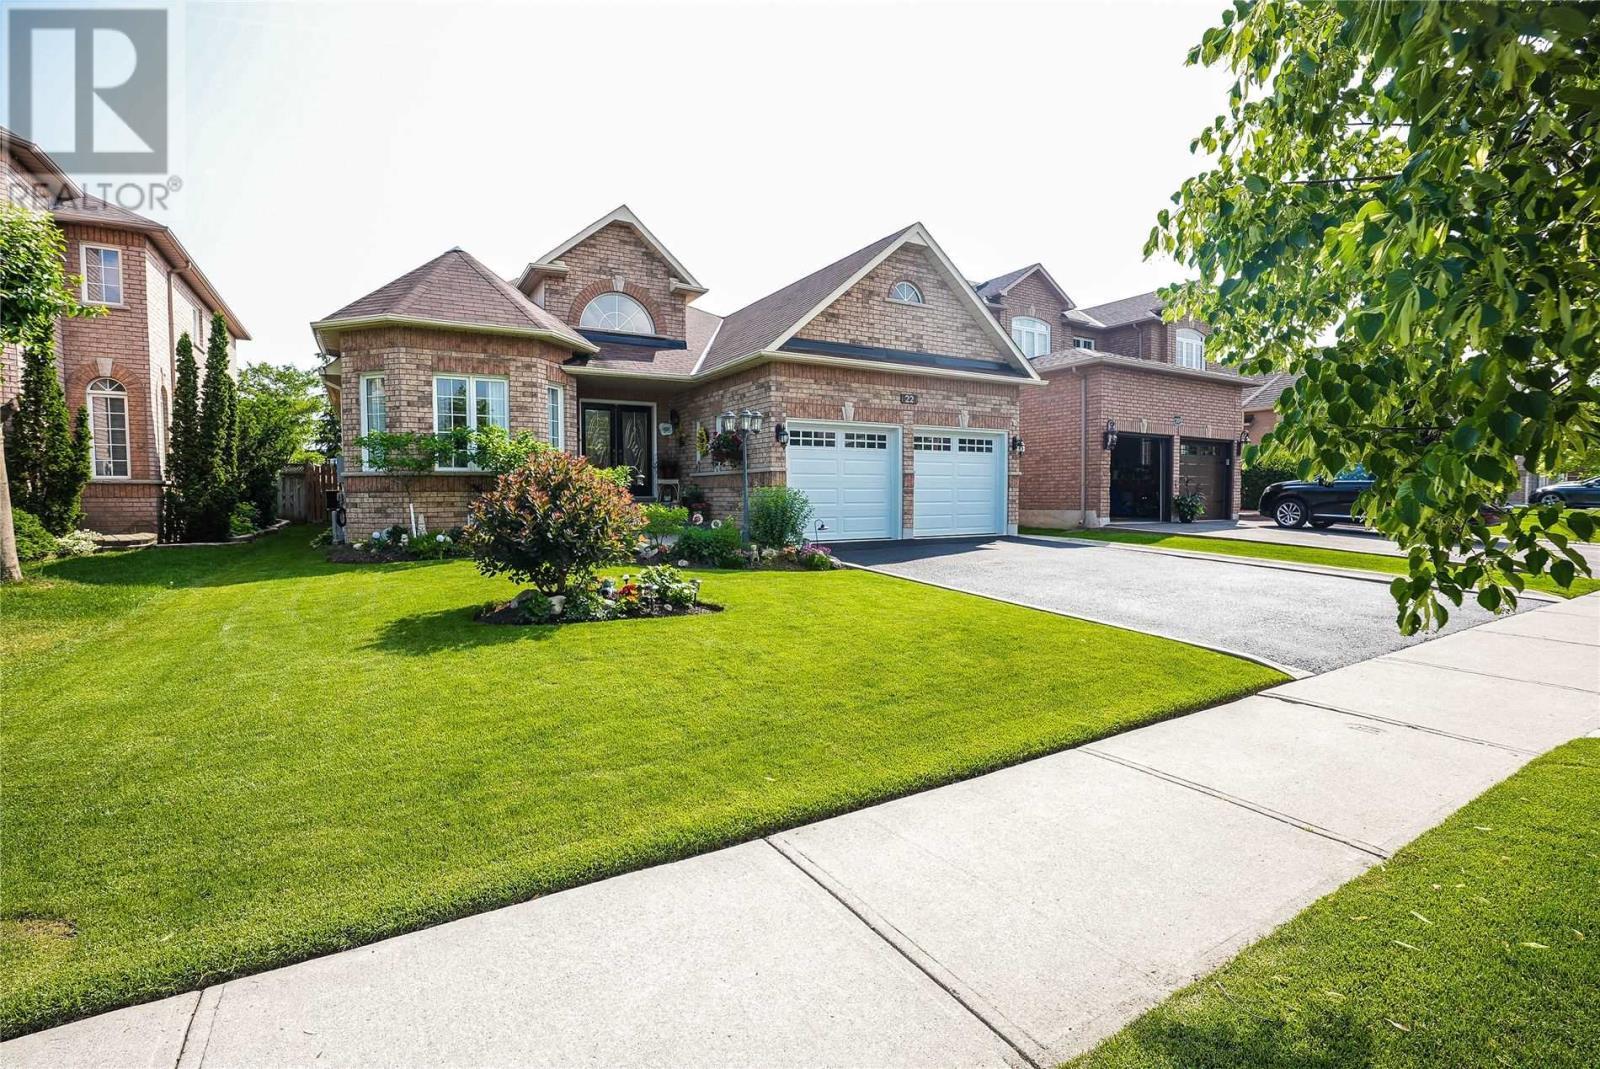 22 Robinson Rd, Halton Hills, Ontario  L7G 6G5 - Photo 1 - W5287864